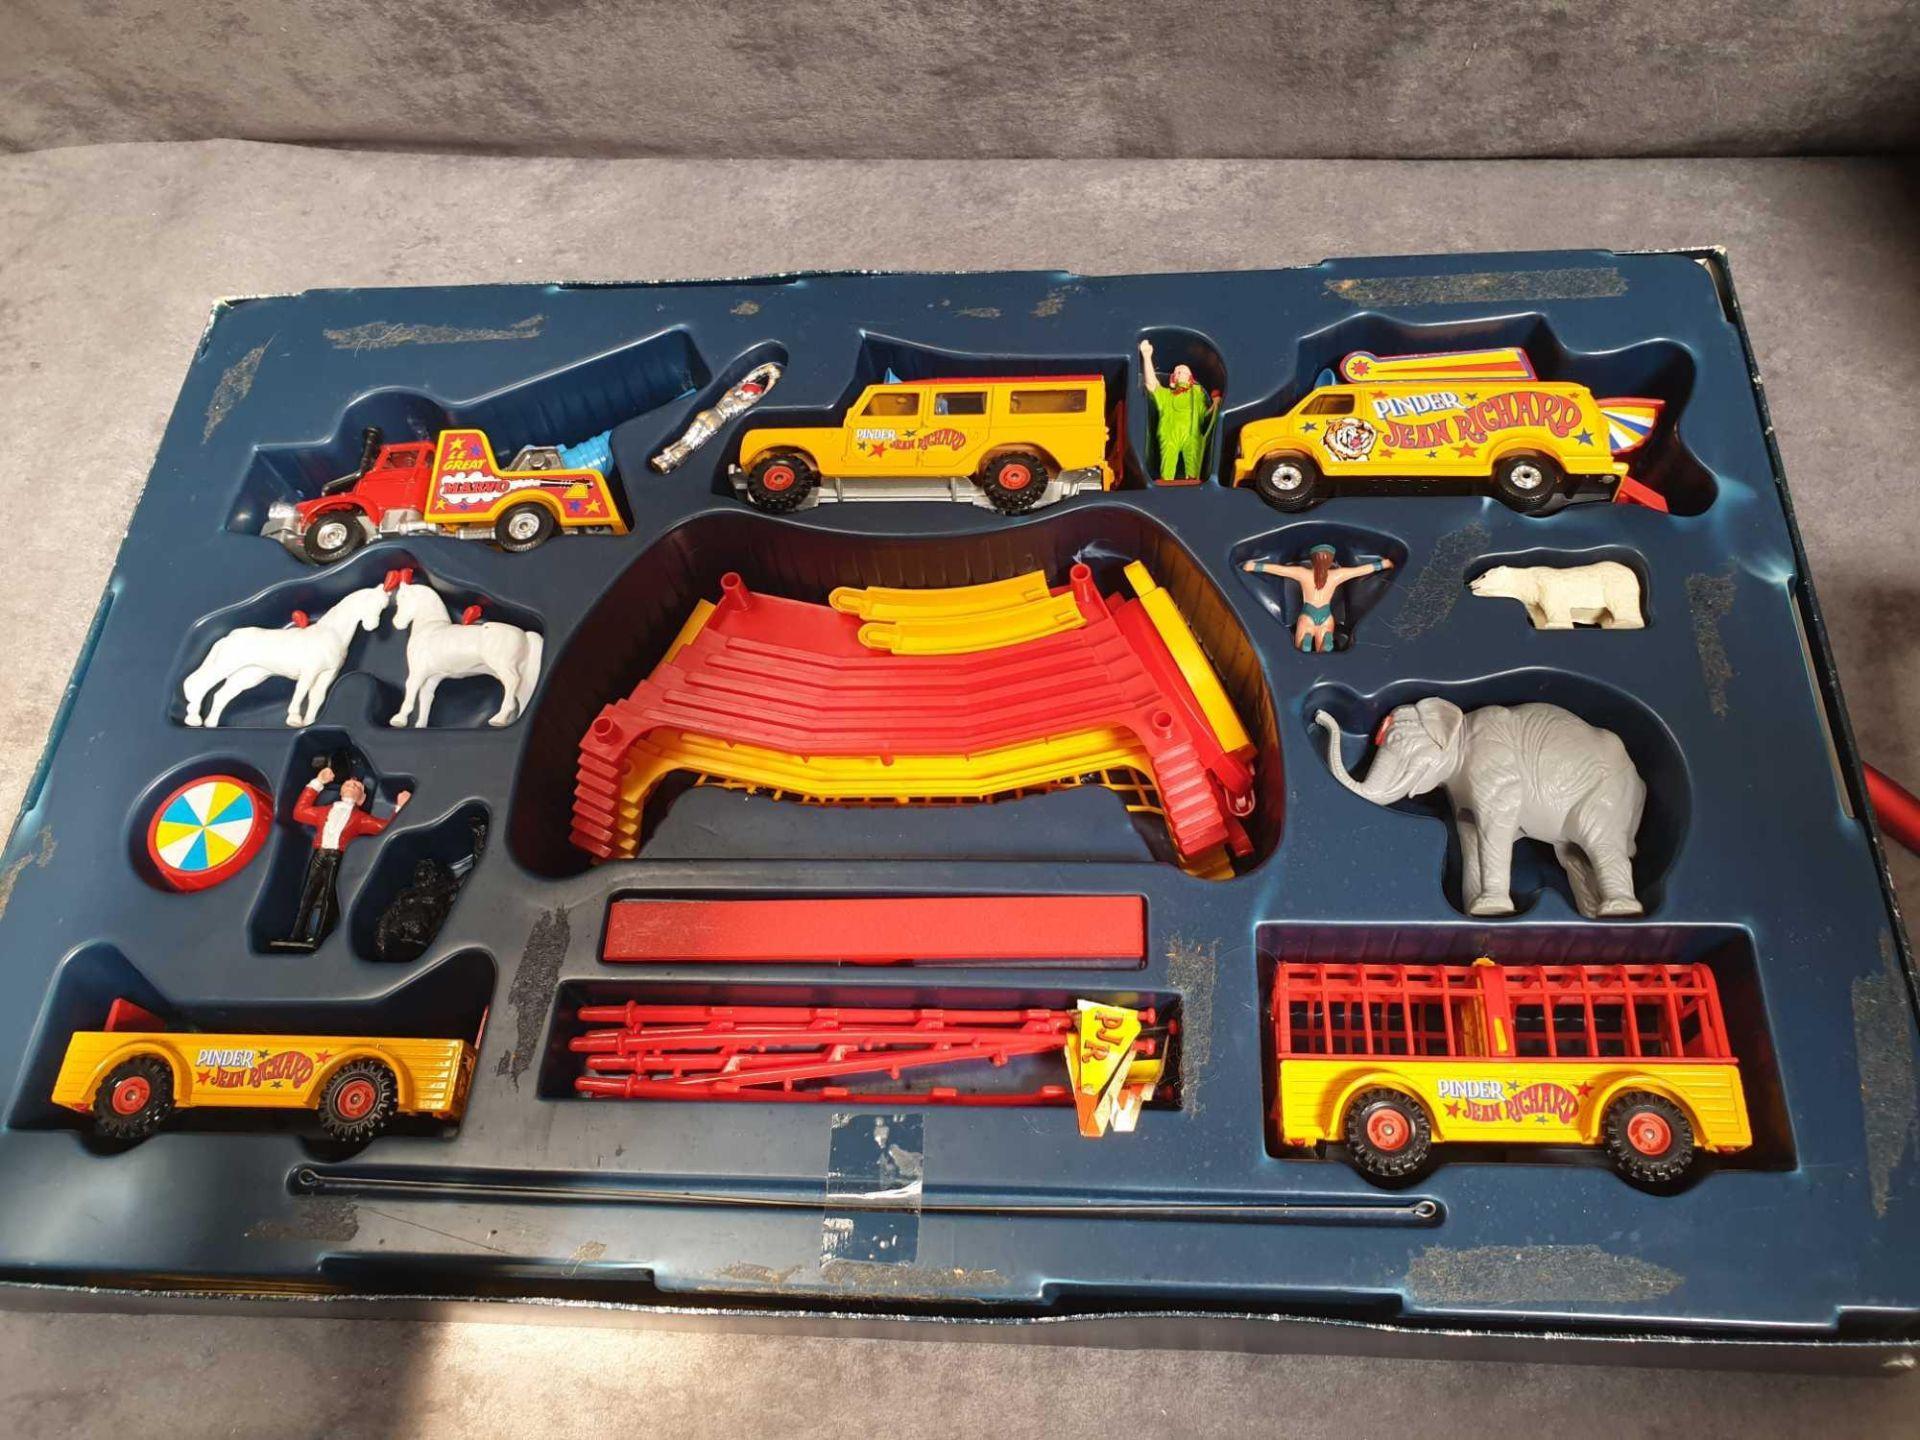 Excellent Corgi Diecast #48 Jean Richard Circus Gift Set Various Circus Vehicles And Accessories.